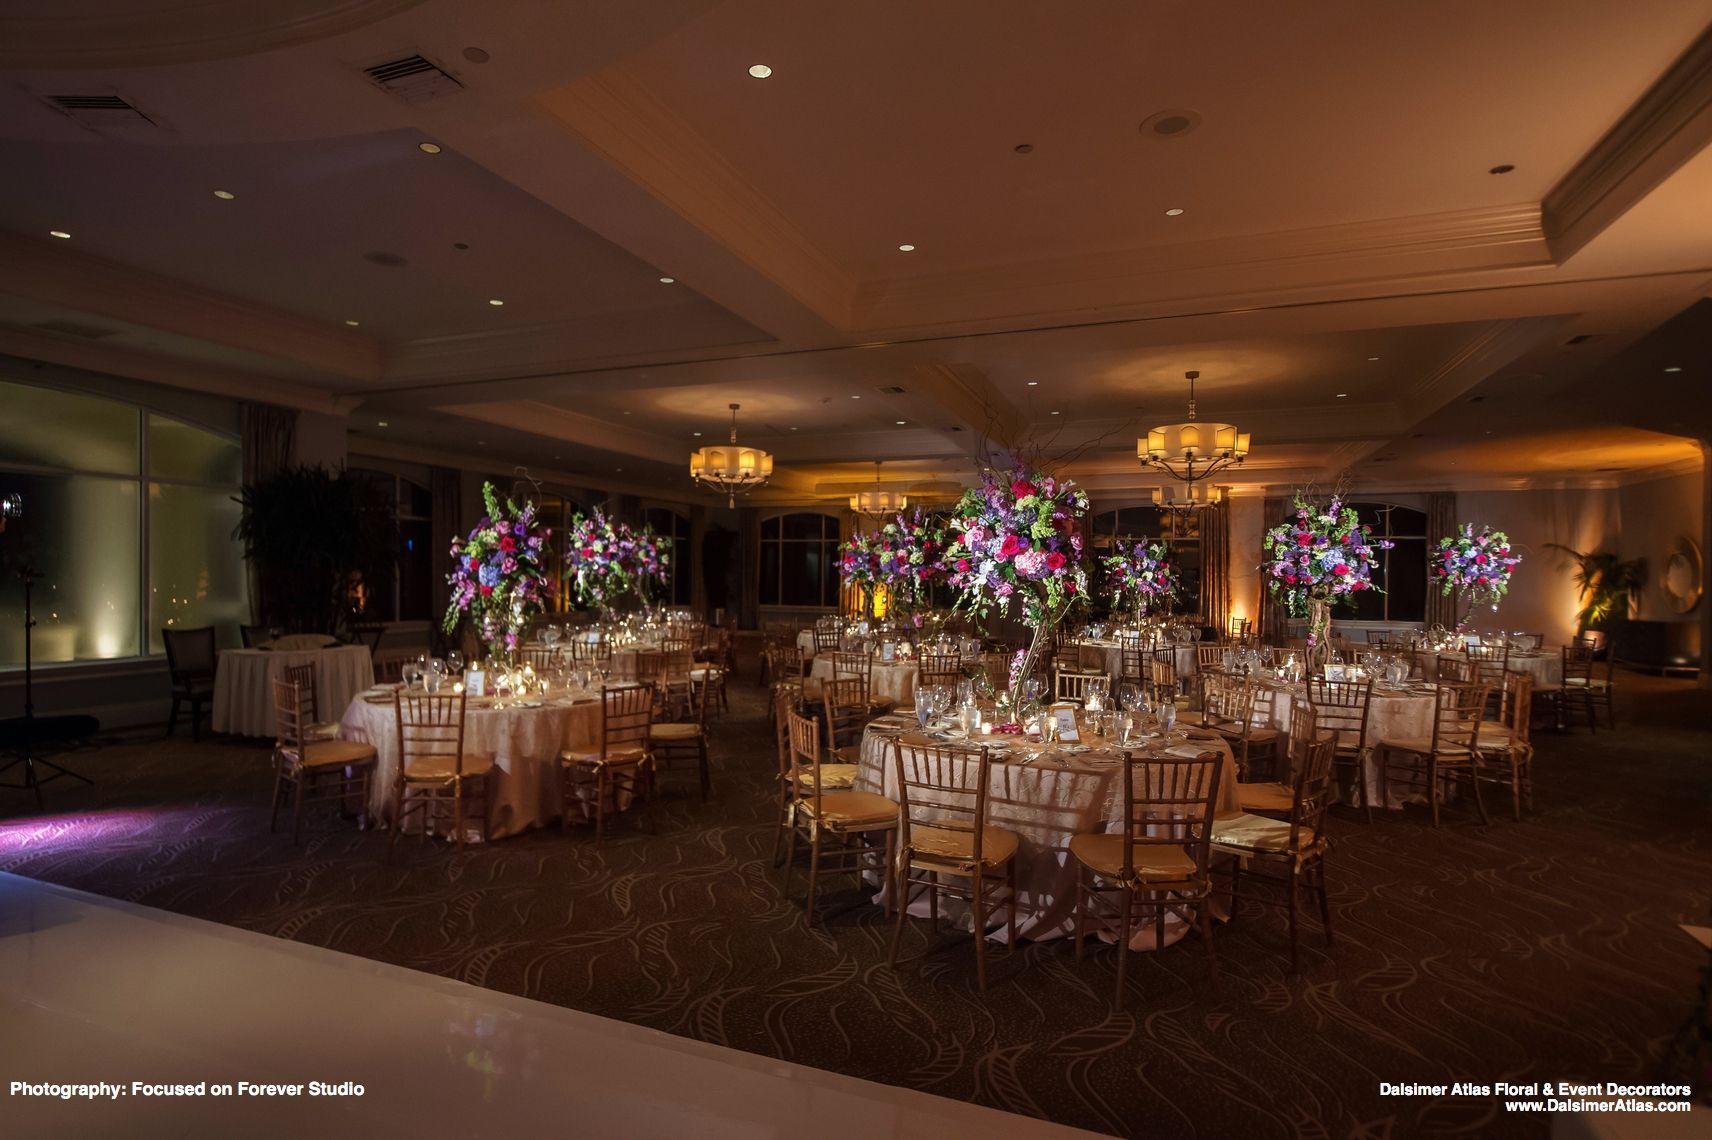 Dalsimer Atlas Fl Event Decorators Wedding Temma And Marc Ballenisles Country Club